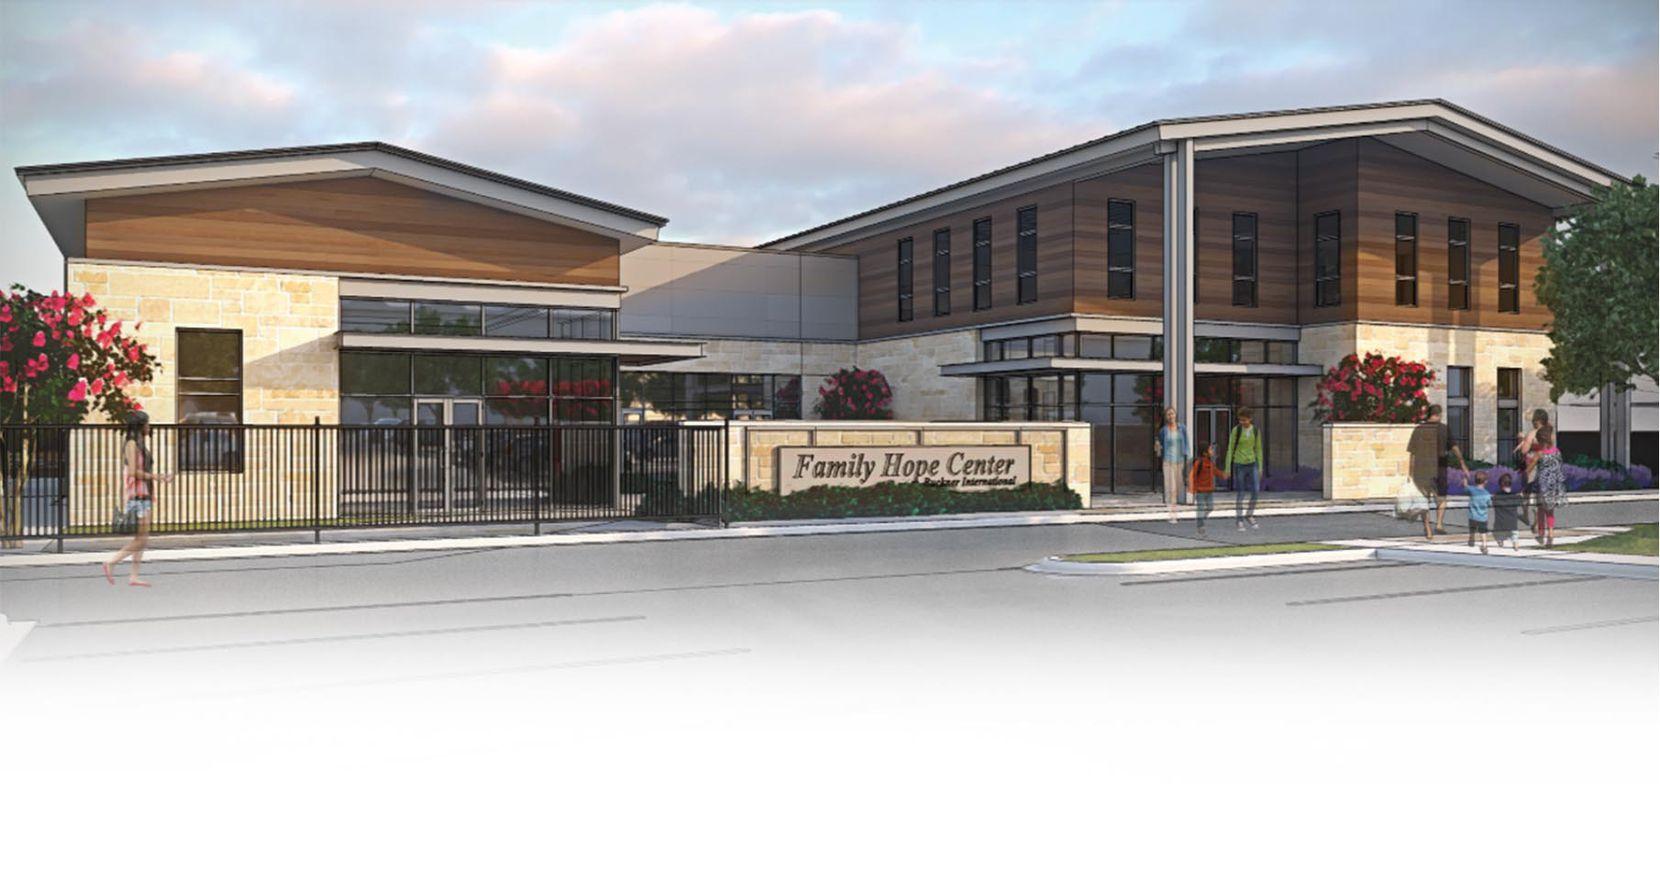 El futuro Family Hope Center en Bachman Lake. CORTESÍA